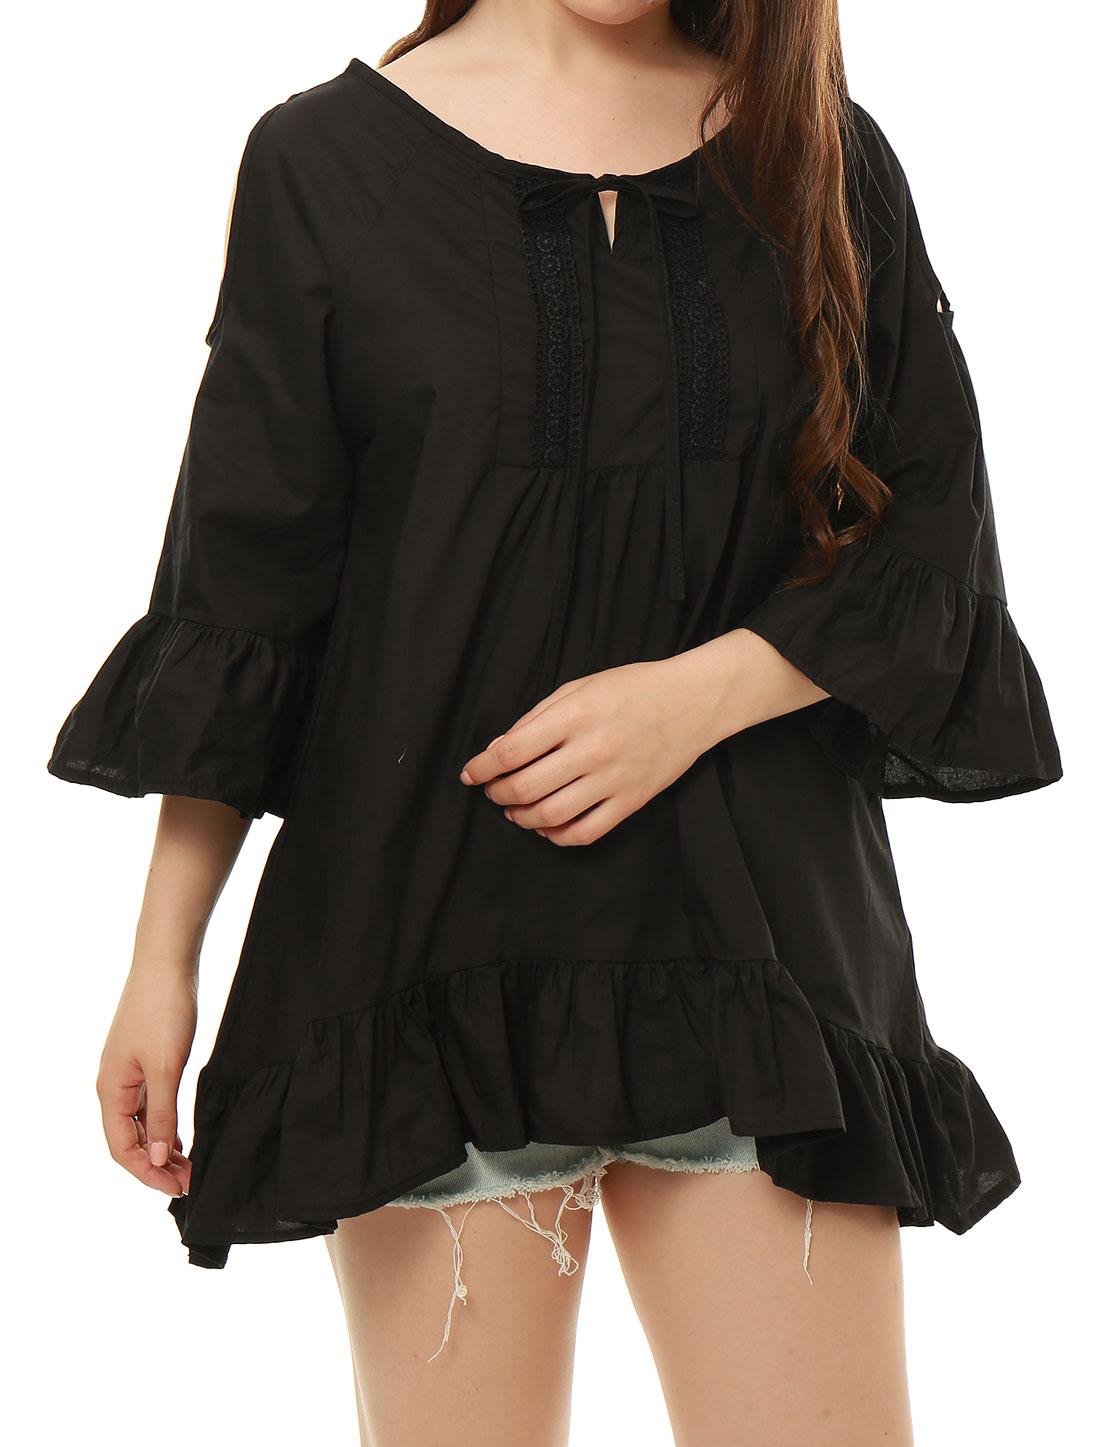 Women Cut Out Bell Sleeves Asymmetrical Hem Tunic Shirt Black S